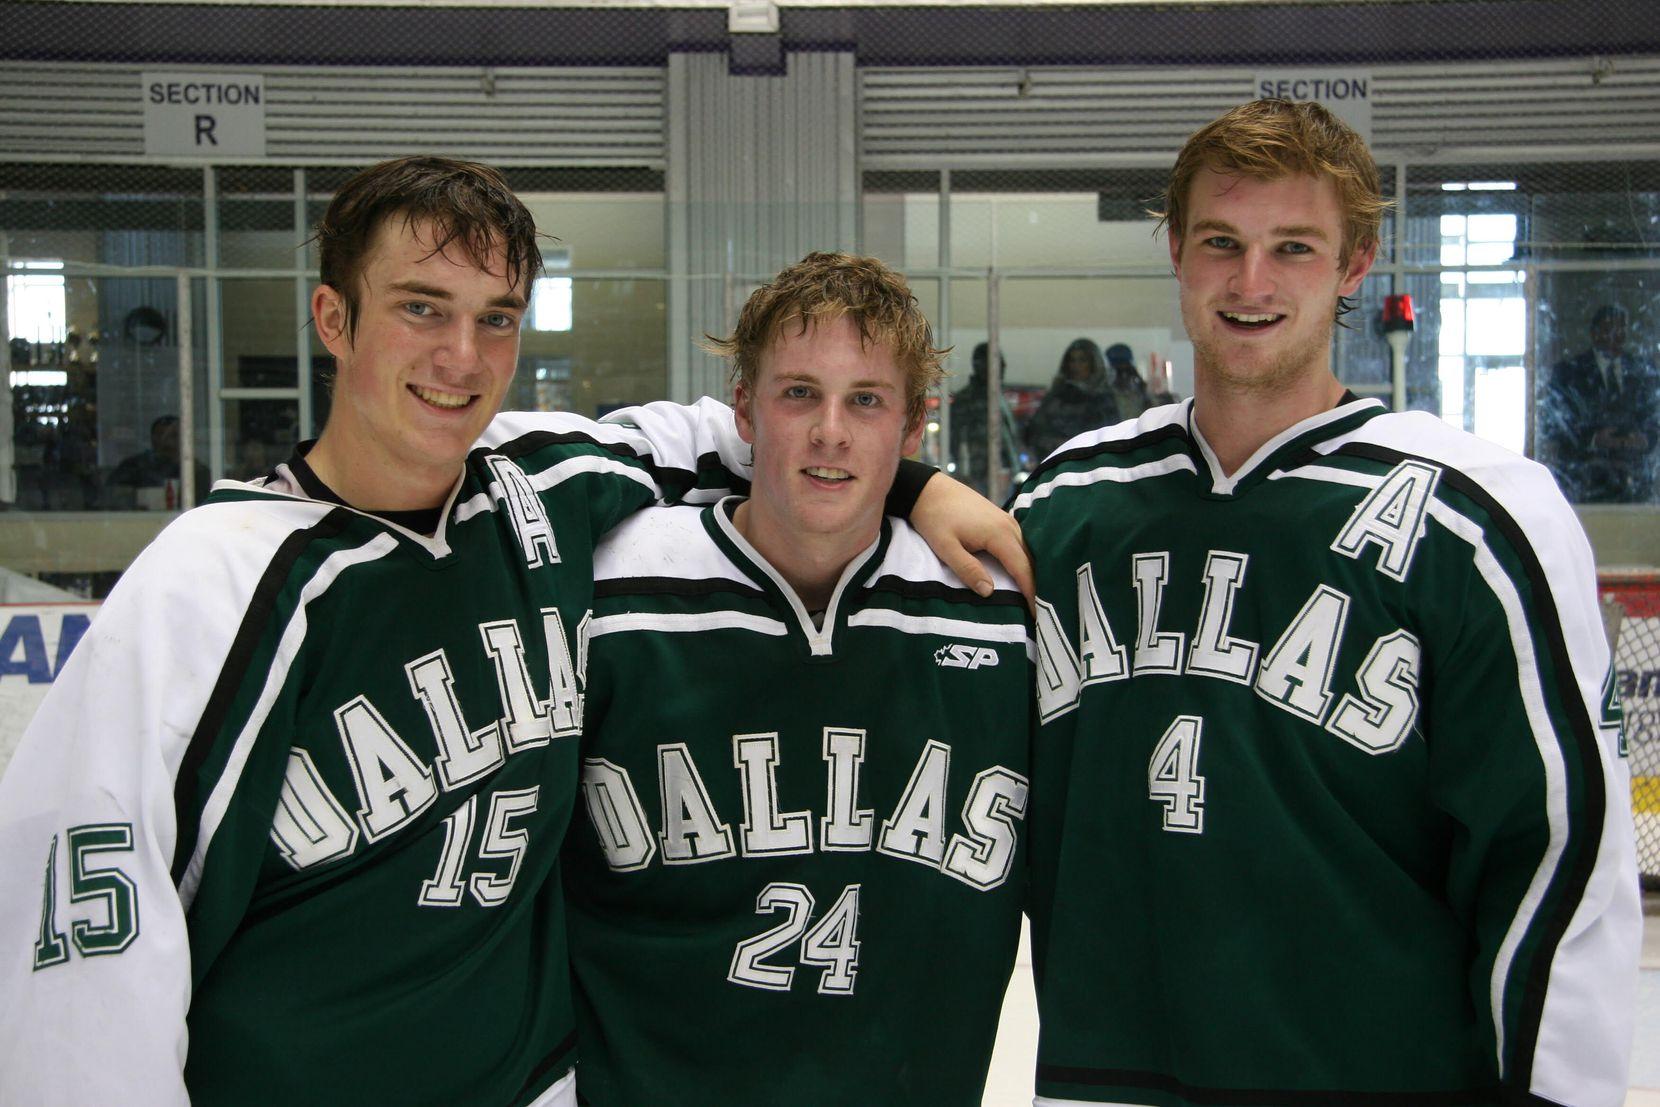 Blake Coleman (24) as a member of the Dallas Stars Elite Hockey Club.